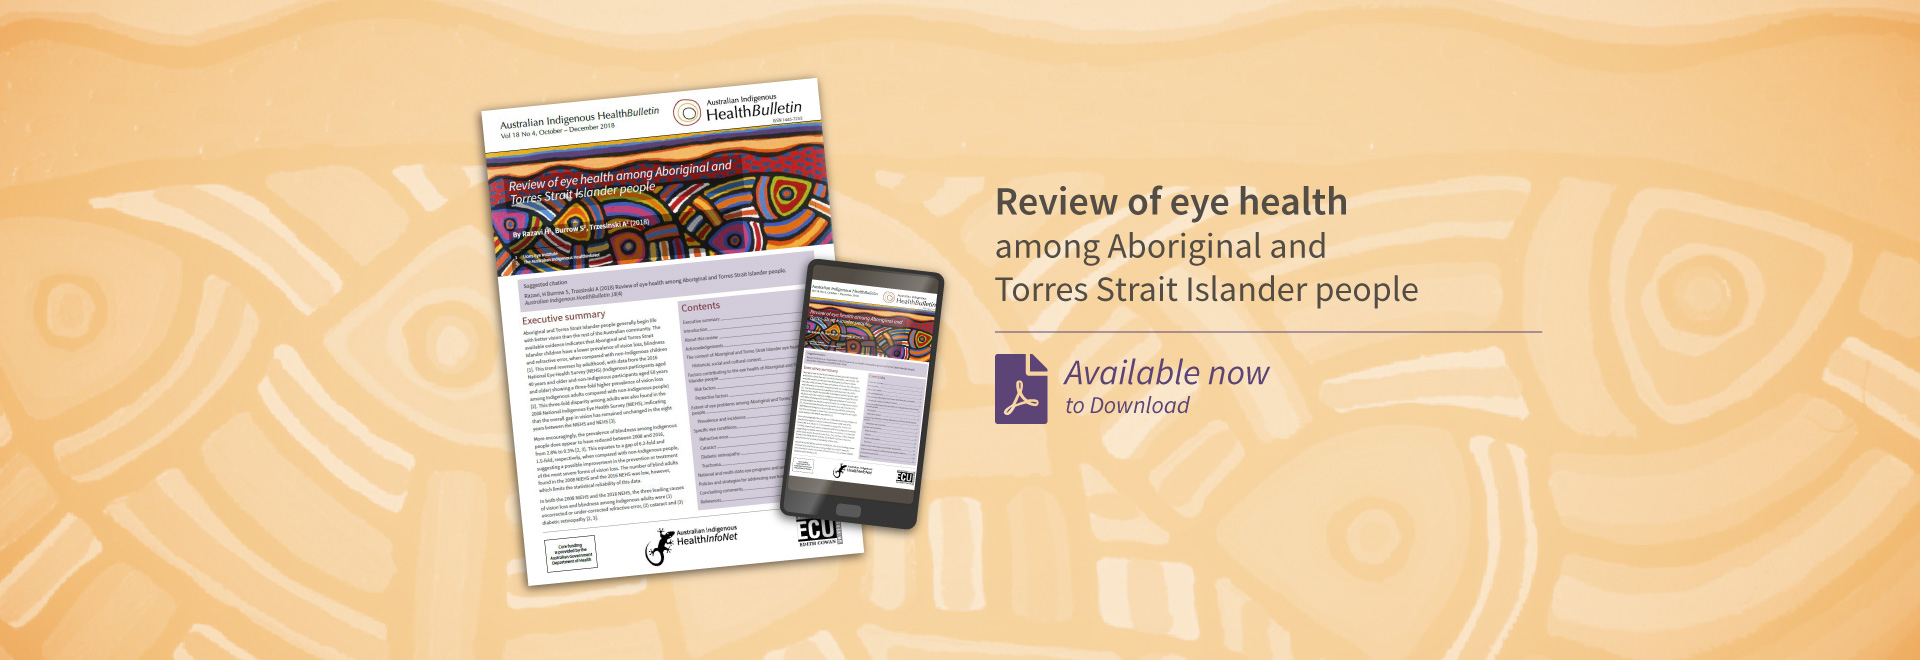 Eye health review